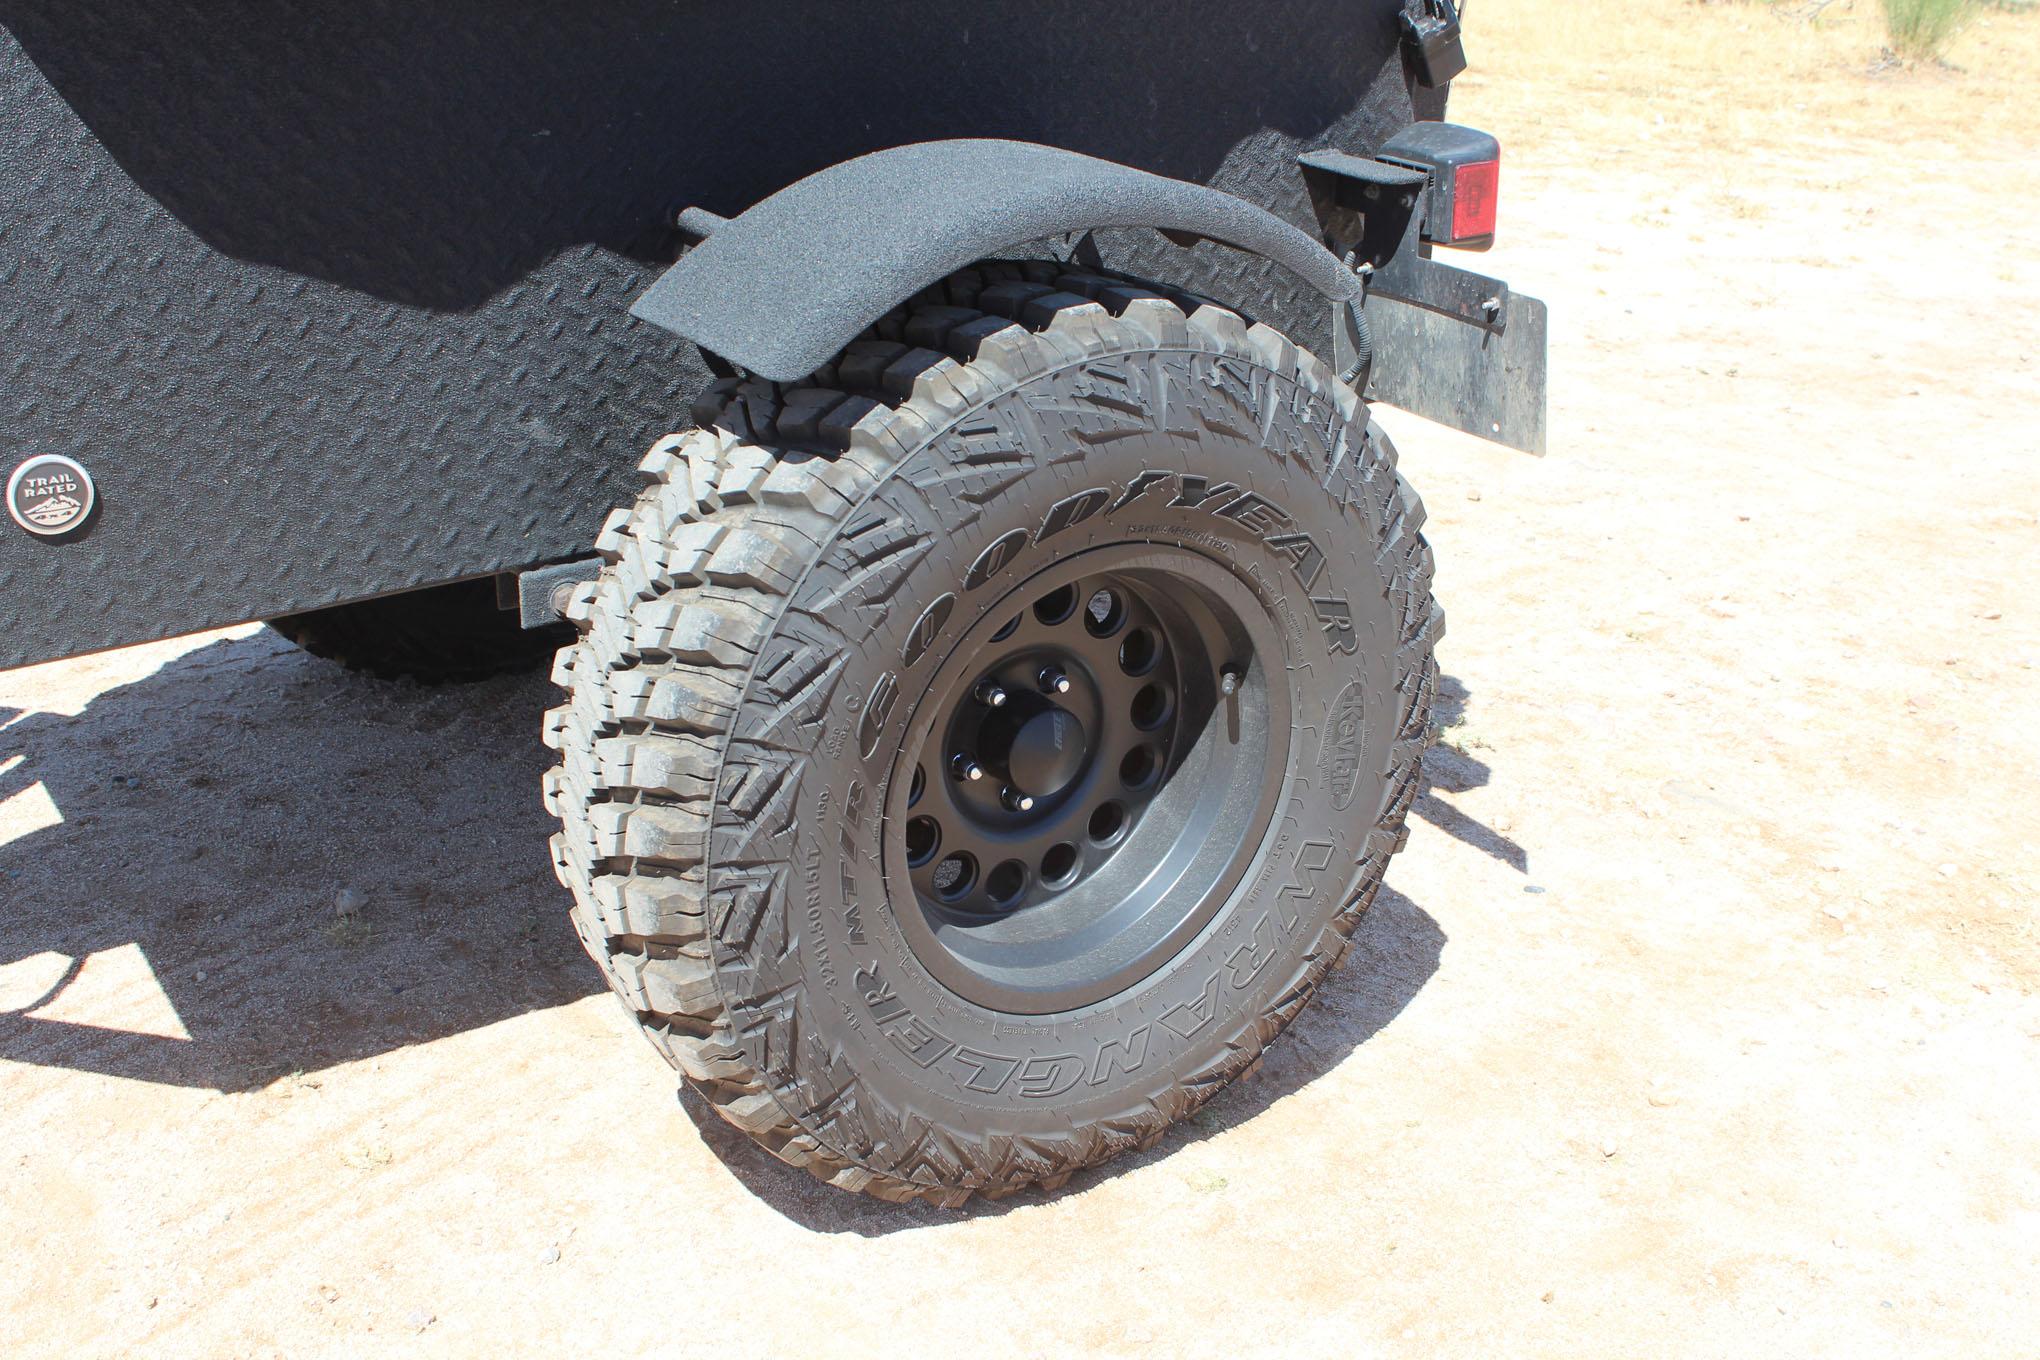 019 four wheeler aaron meyer 2006 jeep wrangler